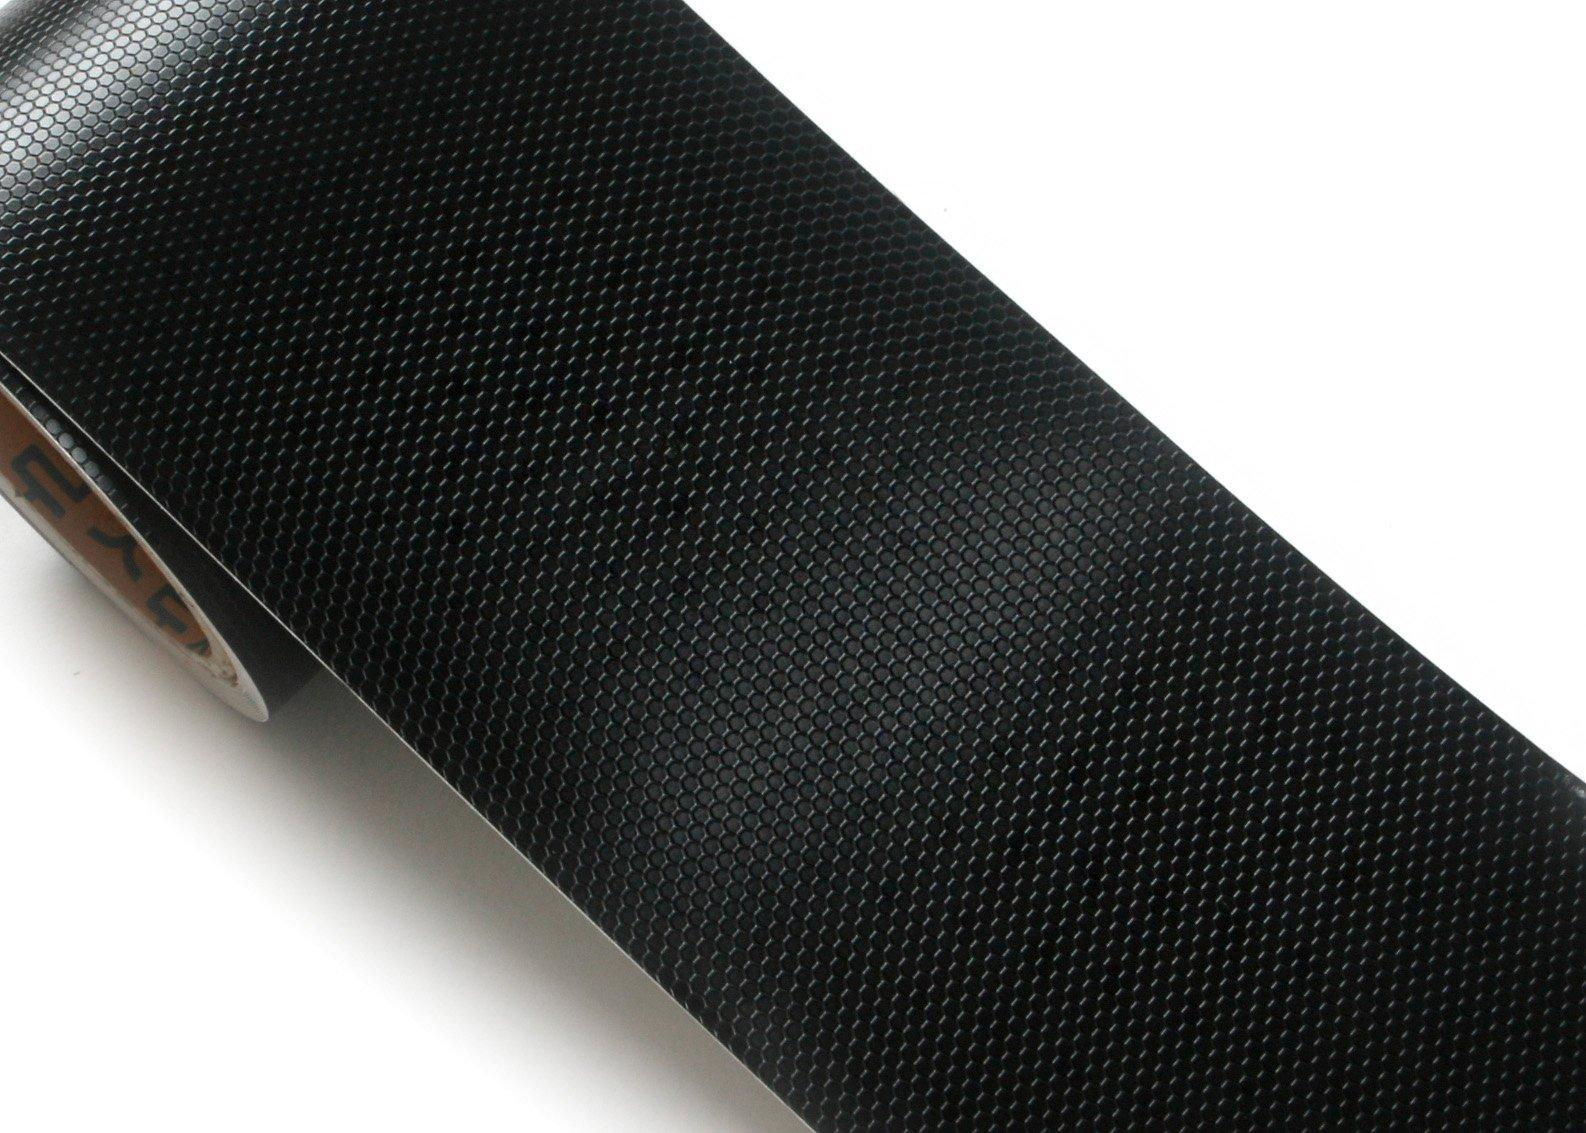 ROSEROSA Peel & Stick Backsplash Reverse Check Arirang Honeycomb Textured Vinyl Contact paper Interior Film Shelf Liner Table and Door Reform (F5610-4B : 3.93 inch X 16.40 ft)